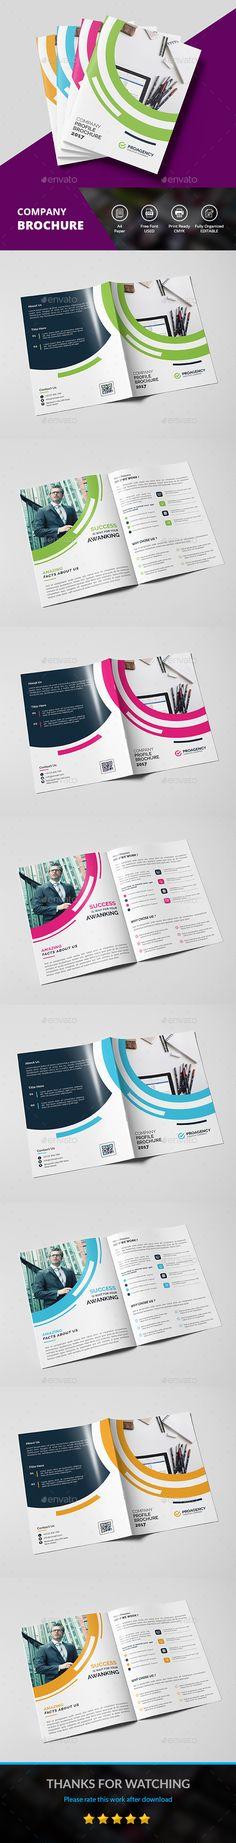 Graphic Design Portfolio Brochure Template Publication Design